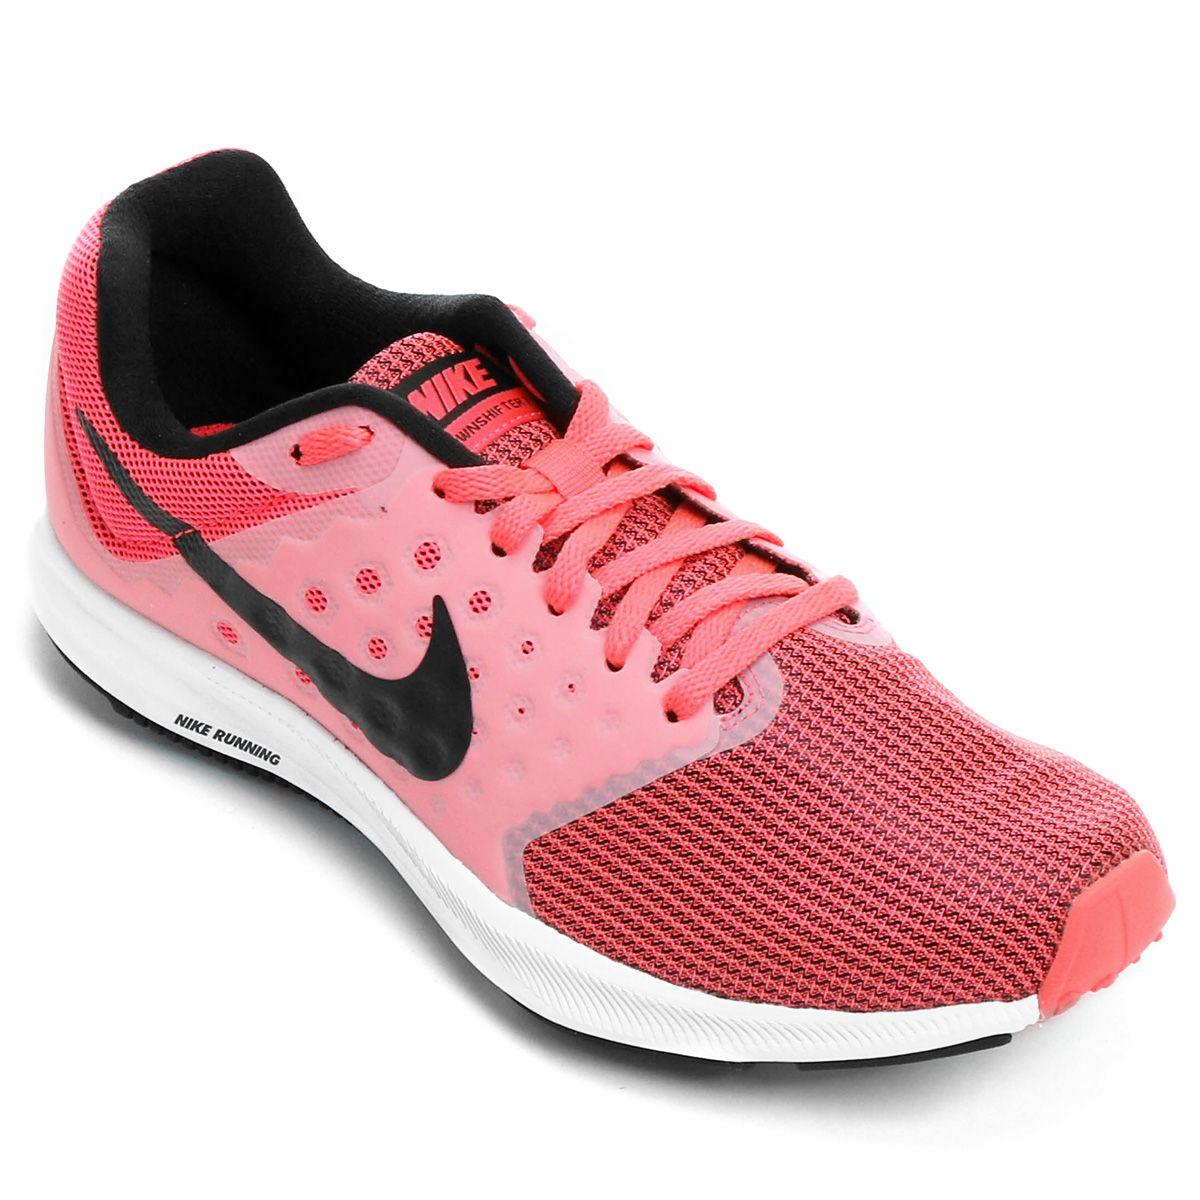 e094aa17818 Tênis Nike Downshifter 7 Feminino Preto e Cinza